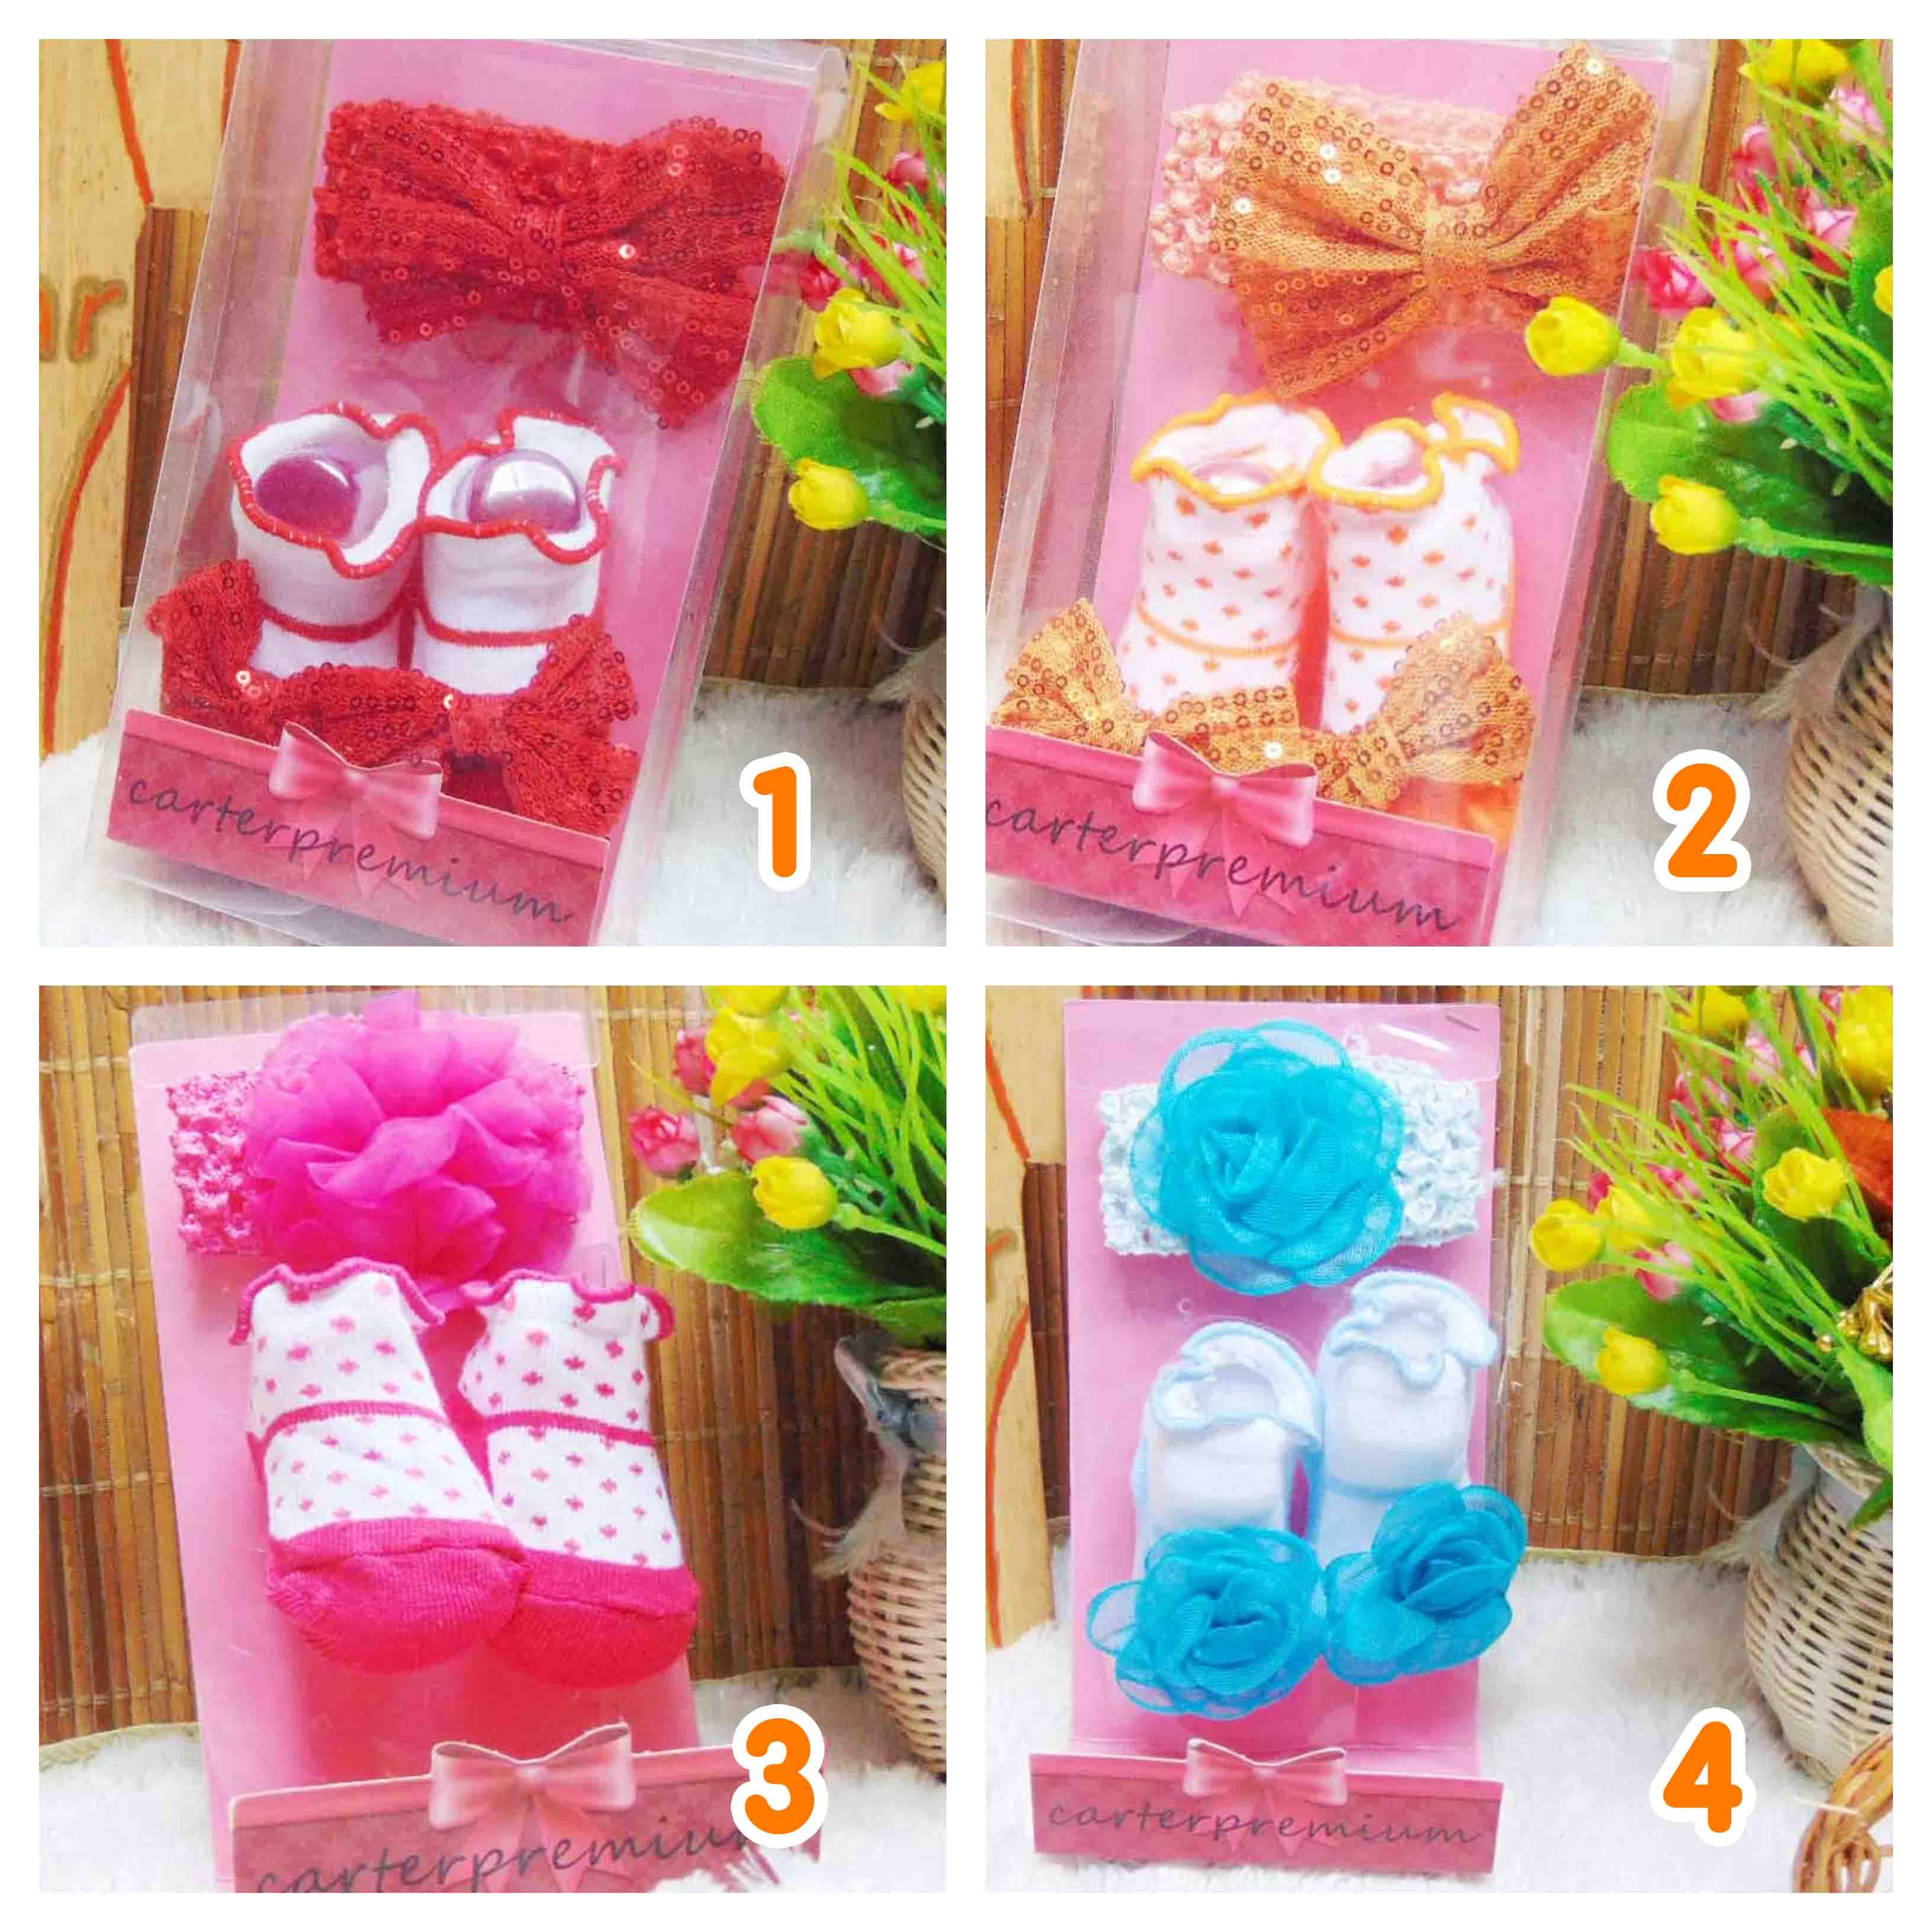 paket kado bayi set kaos kaki bayi newborn perempuan baby girl cantik CARTER PREMIUM plus headband kado SNI (5)